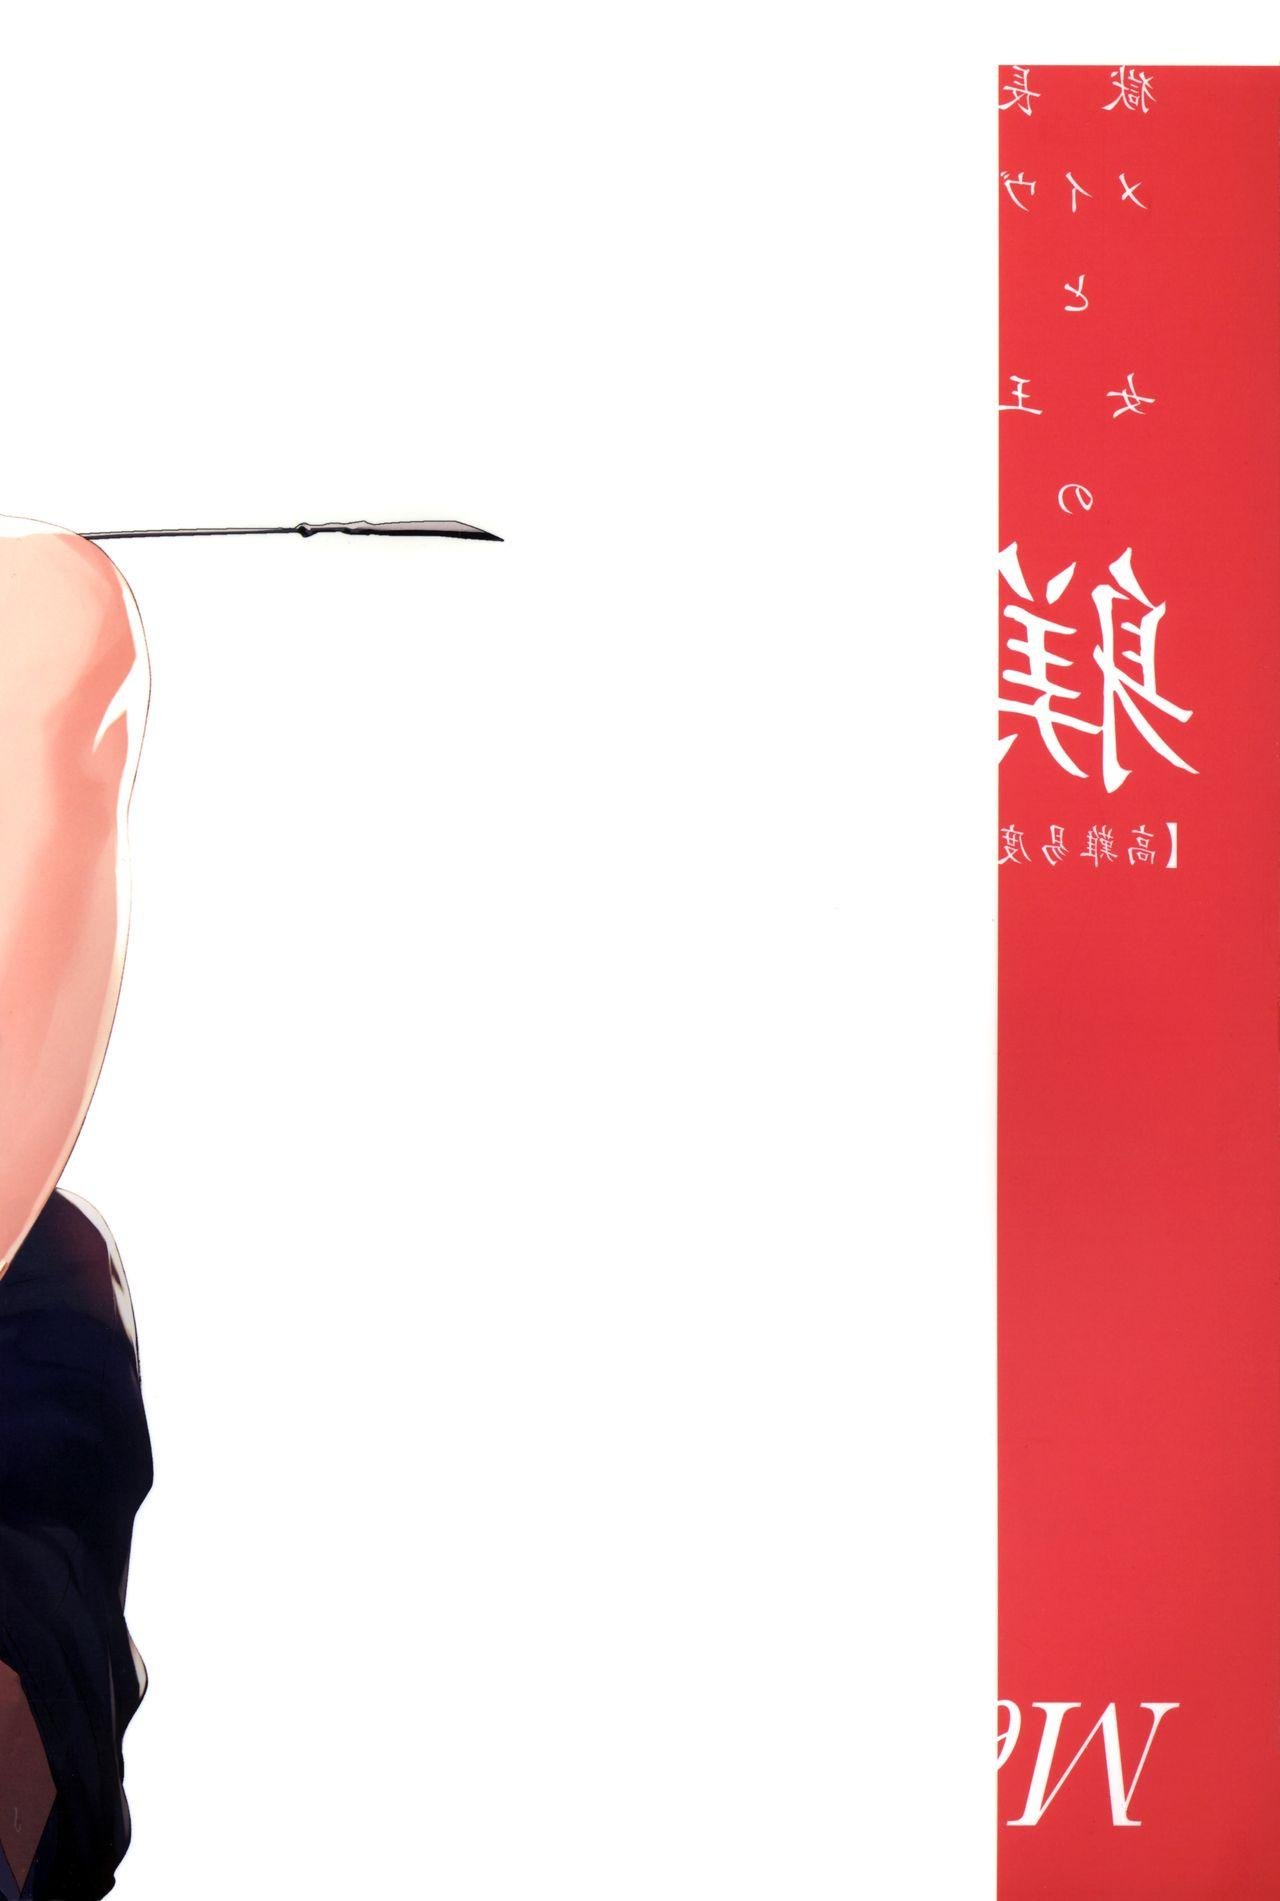 Gokuchou Medb to Joou no Shitsuke | Warden Medb and The Queen's Discipline 28